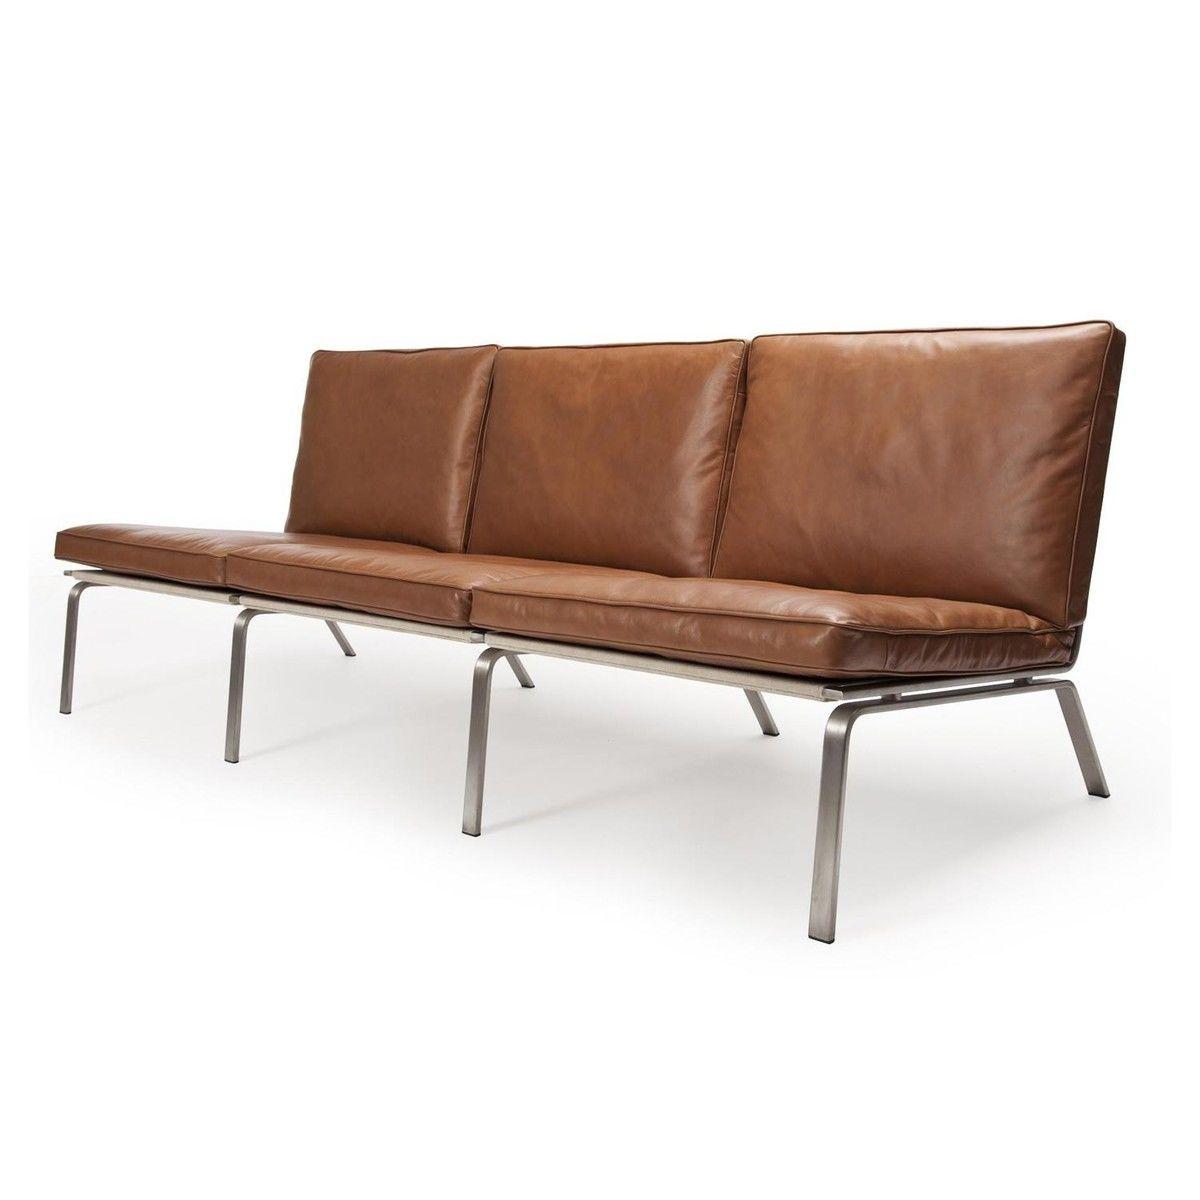 Ledersofa braun lounge  Man Lounge 3-Seater Sofa | NORR 11 | AmbienteDirect.com